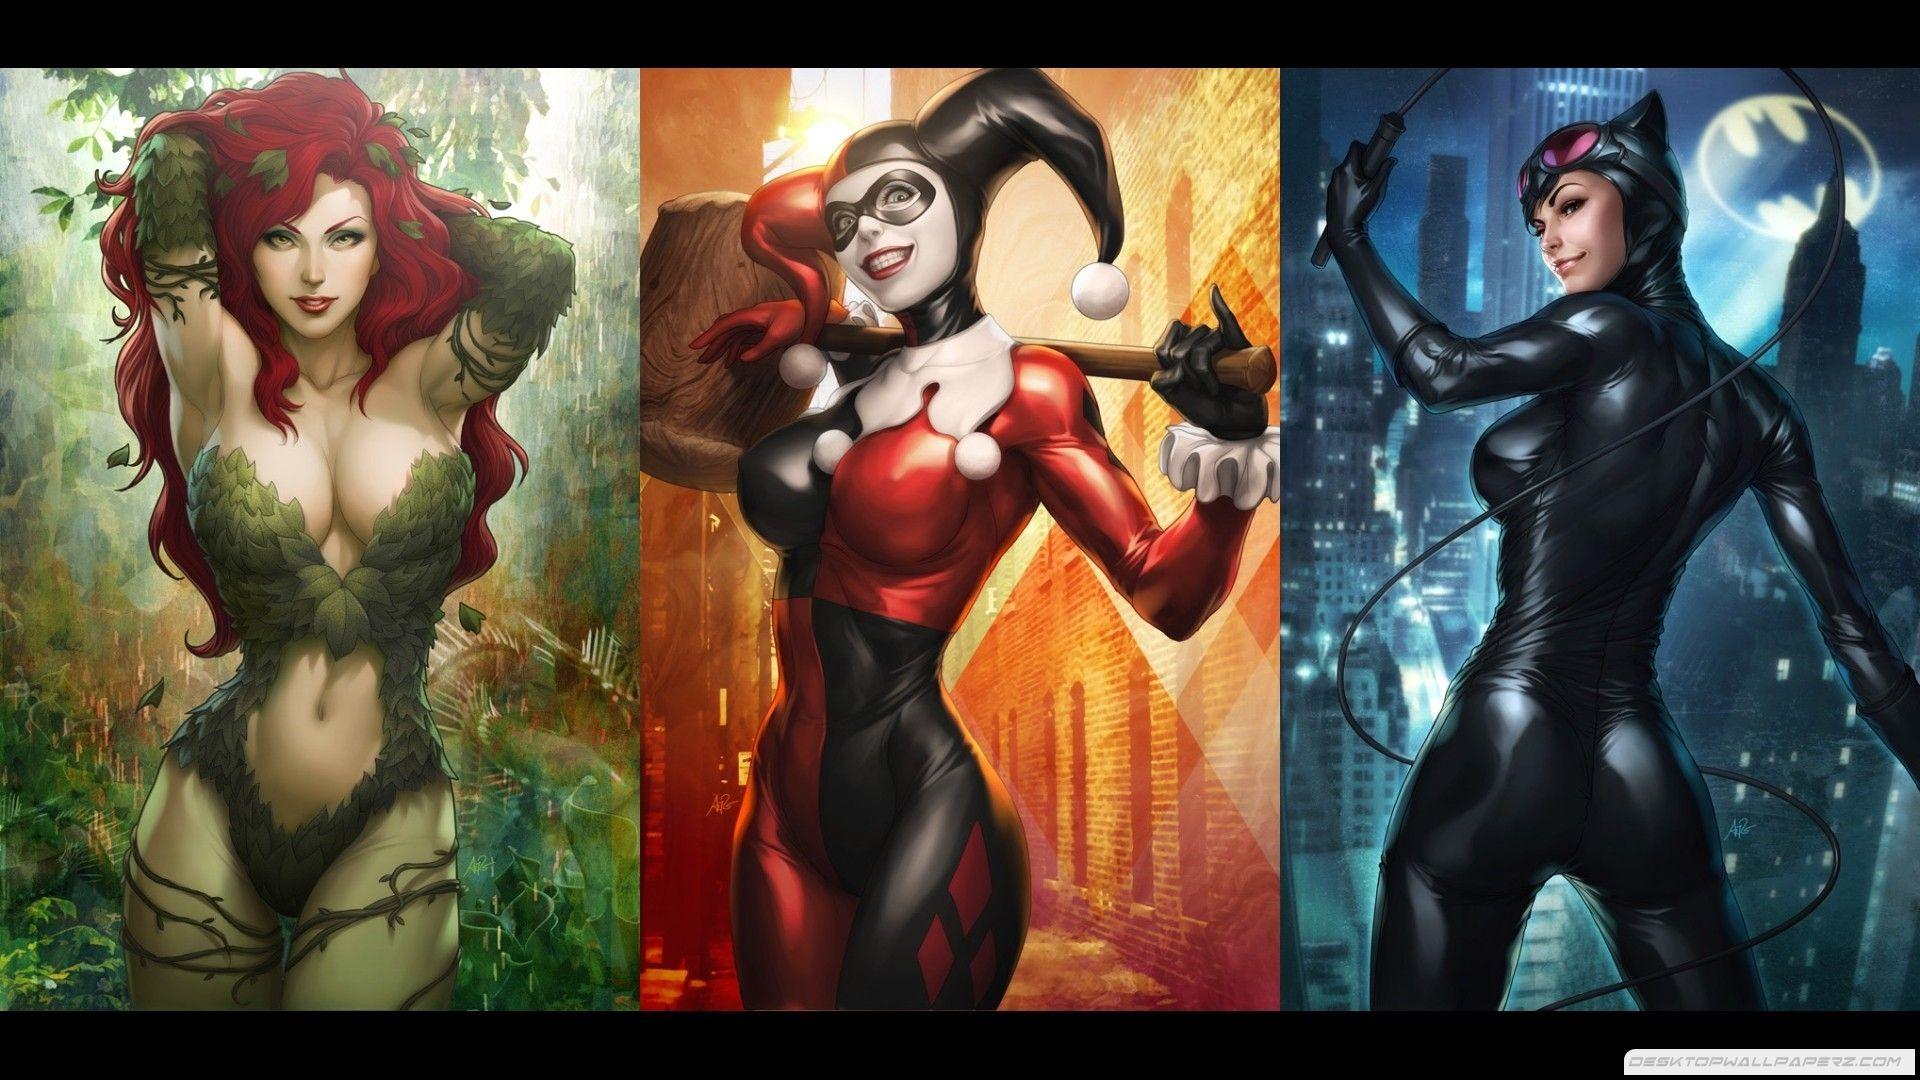 Catwoman harley quinn poison ivy wonder woman supergirl batgirl